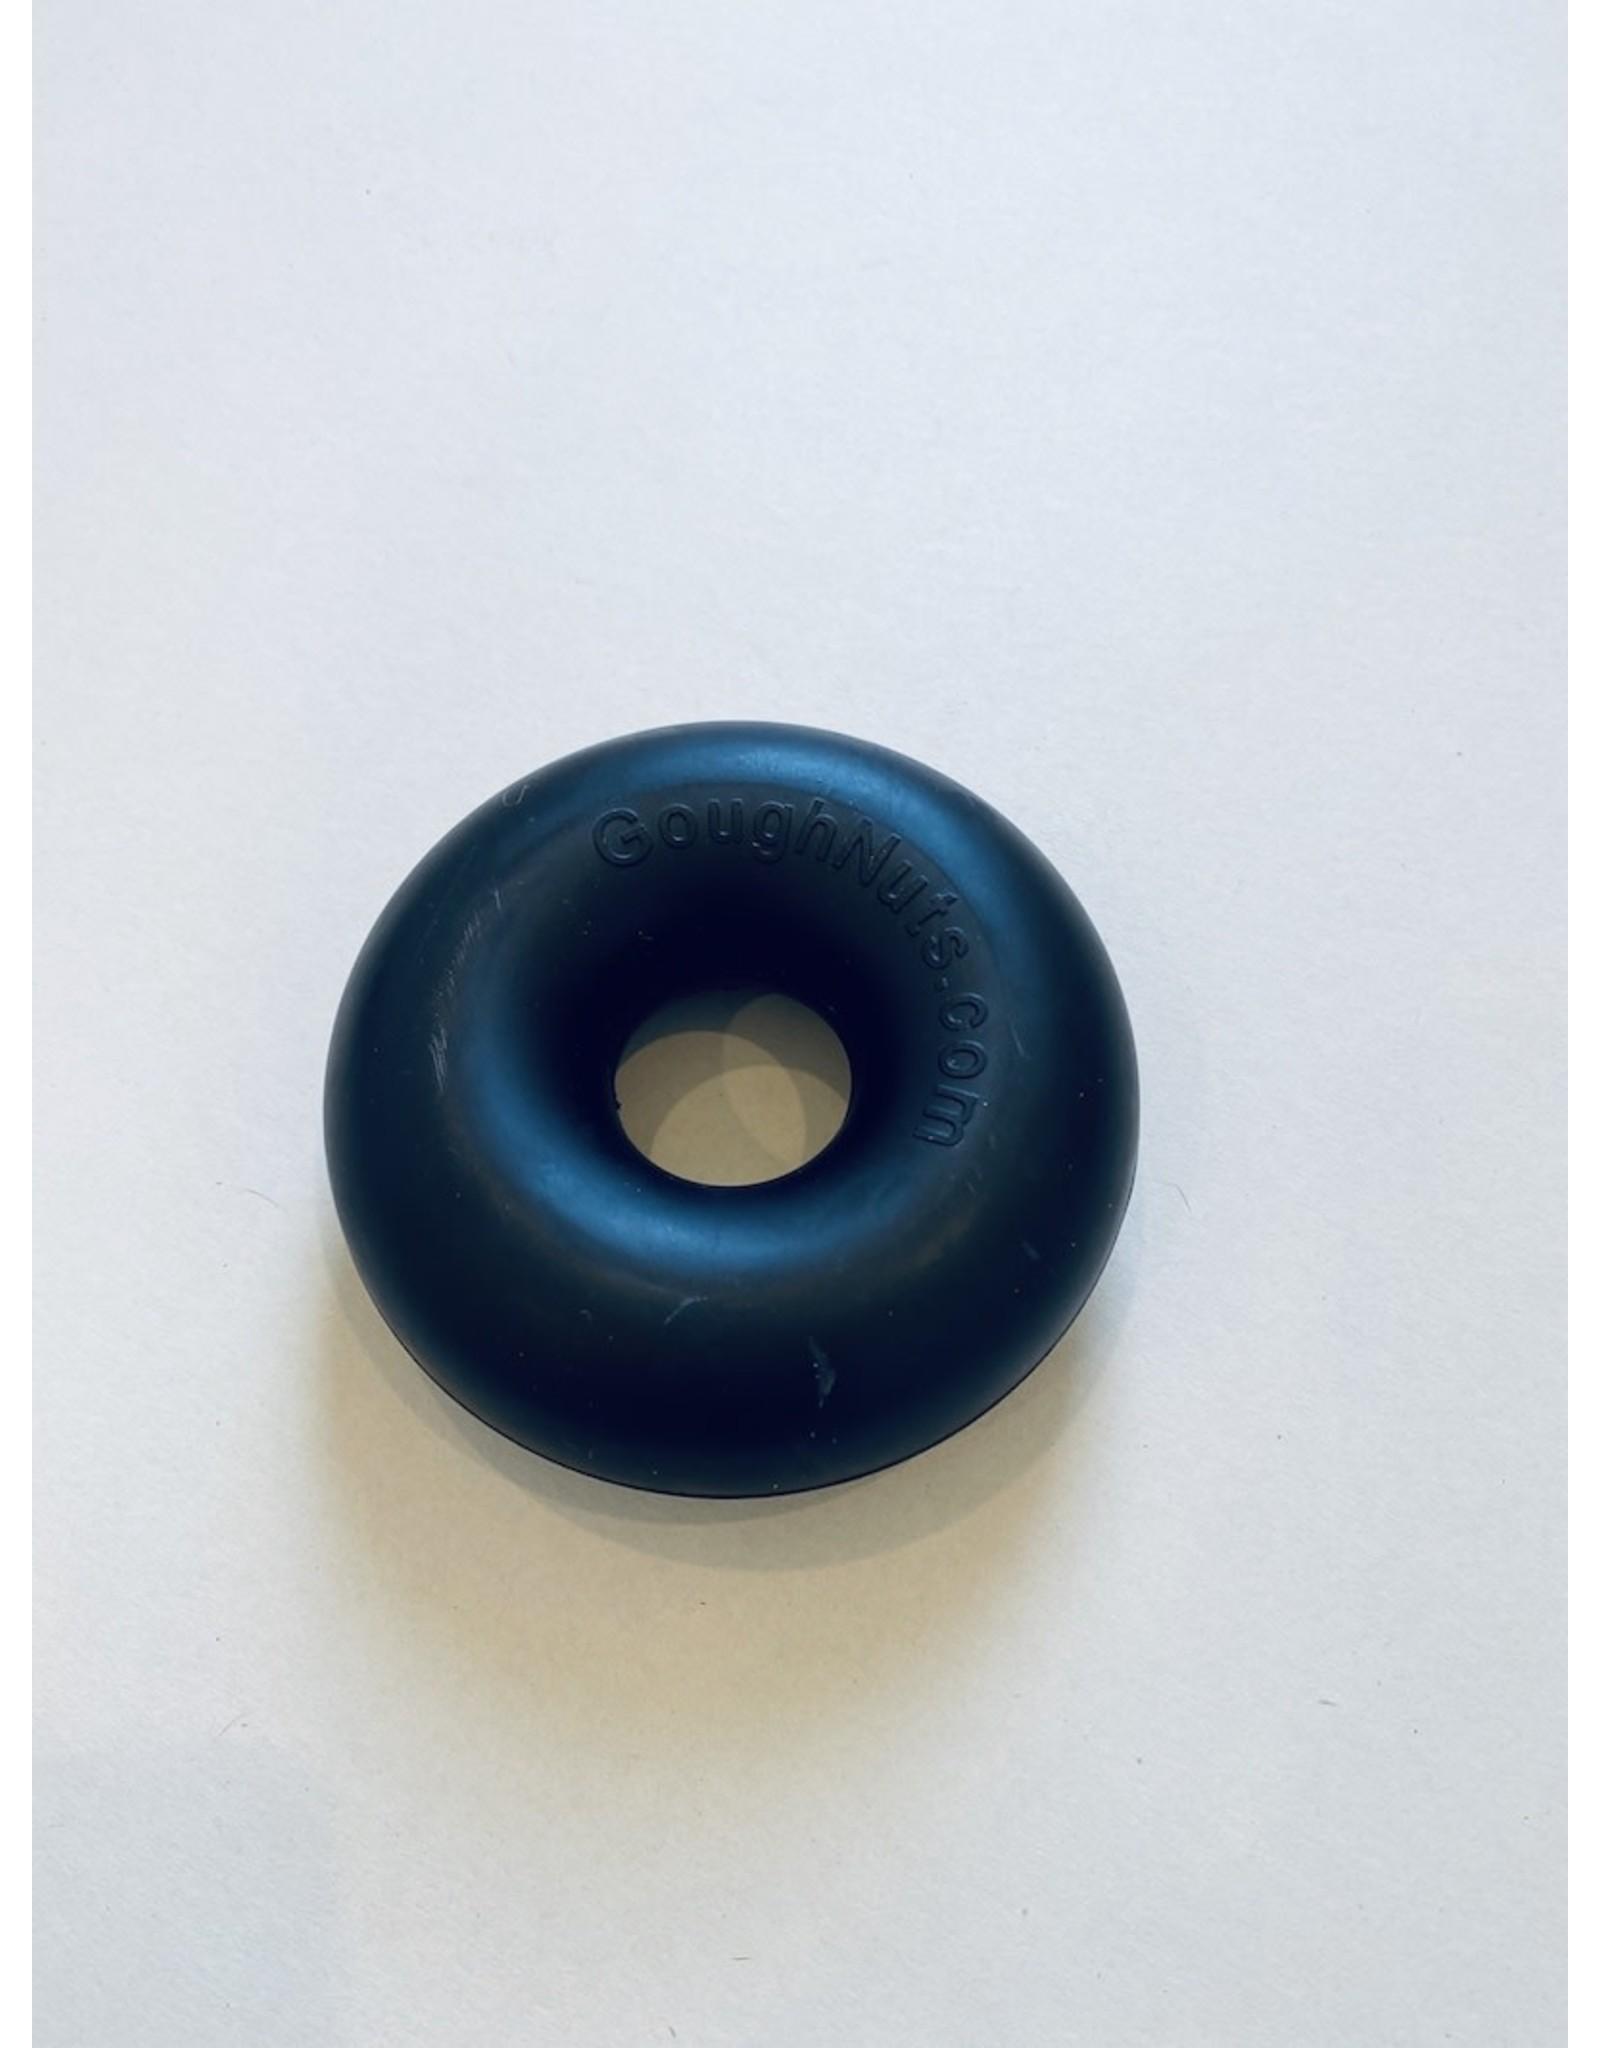 GoughNuts GoughNuts BLACK Original 0.75 Ring +extreme